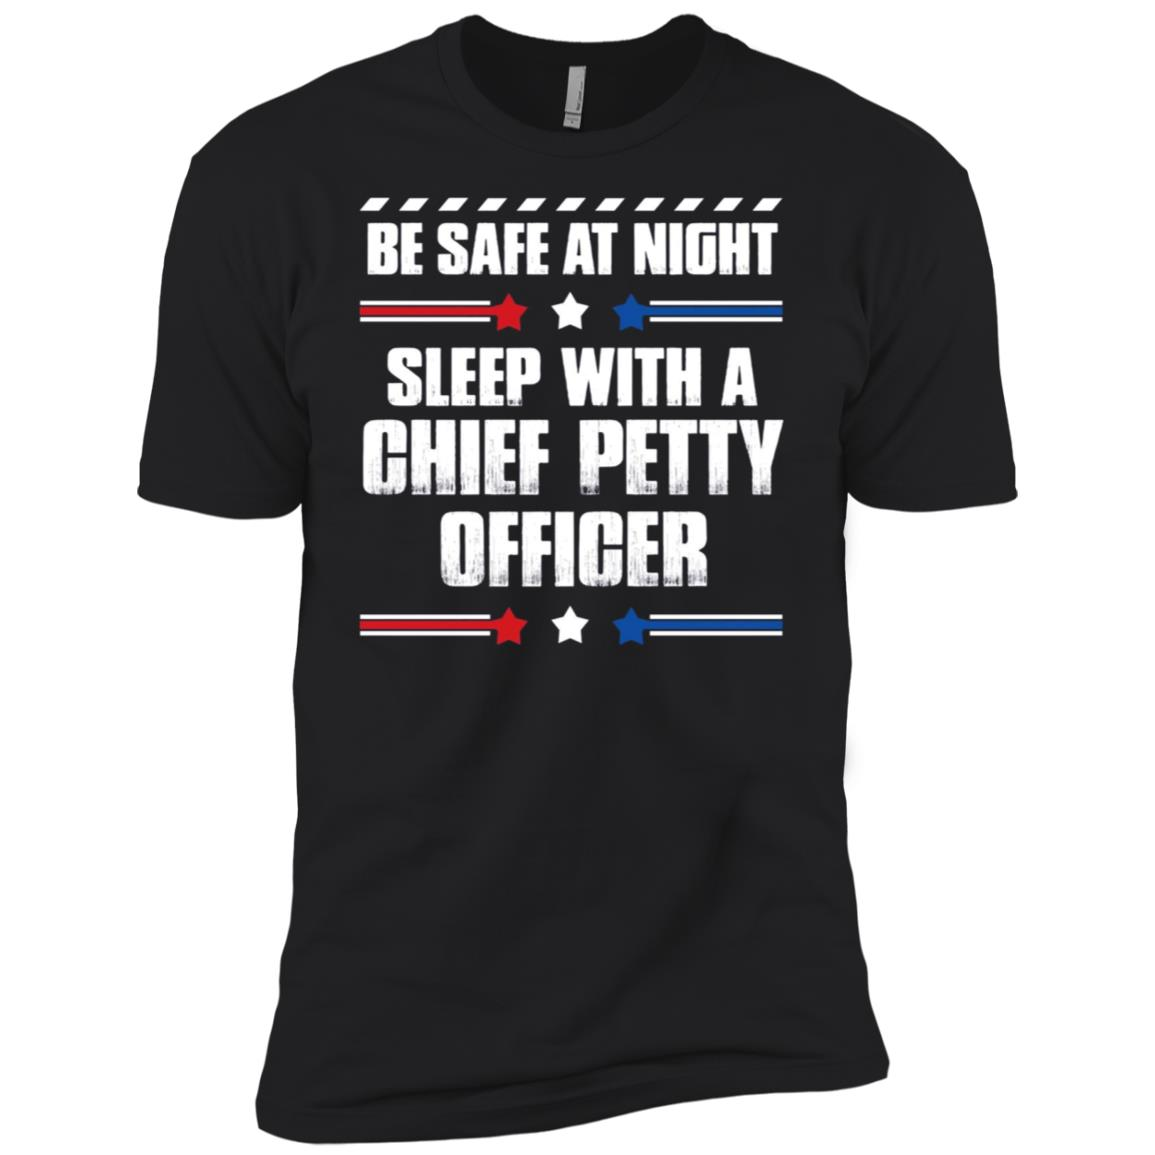 Chief Petty Officer – Be Safe at Night! Men Short Sleeve T-Shirt